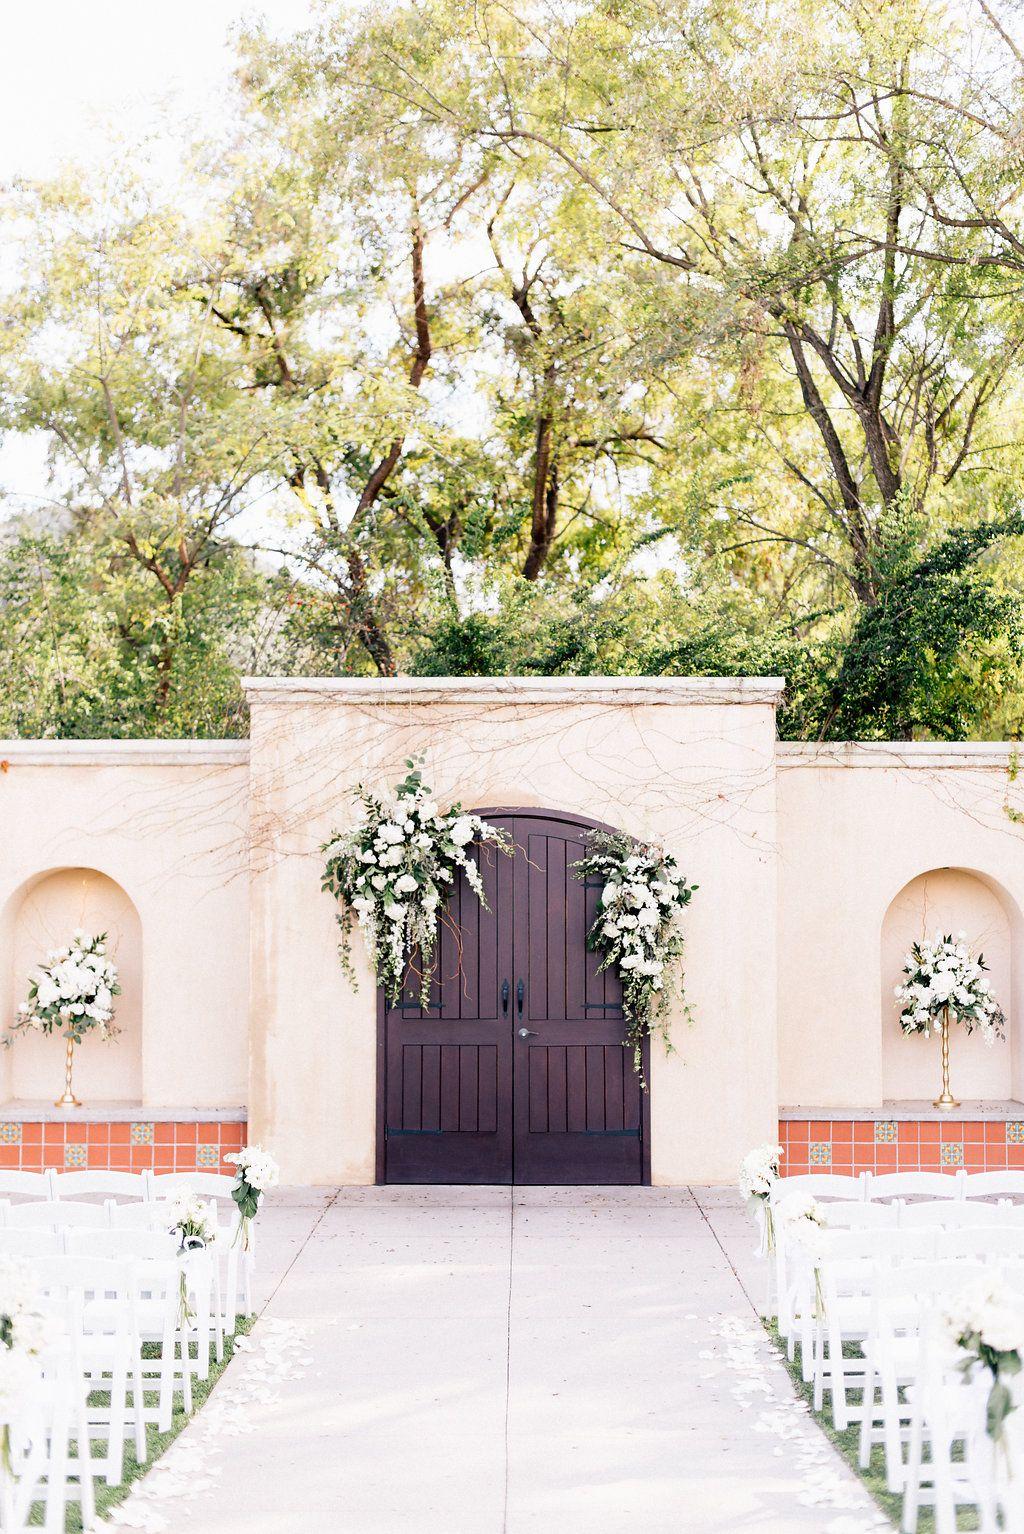 4b6ef1a745f9891bce37e5c214a520b8 - The Gardens At Los Robles Greens